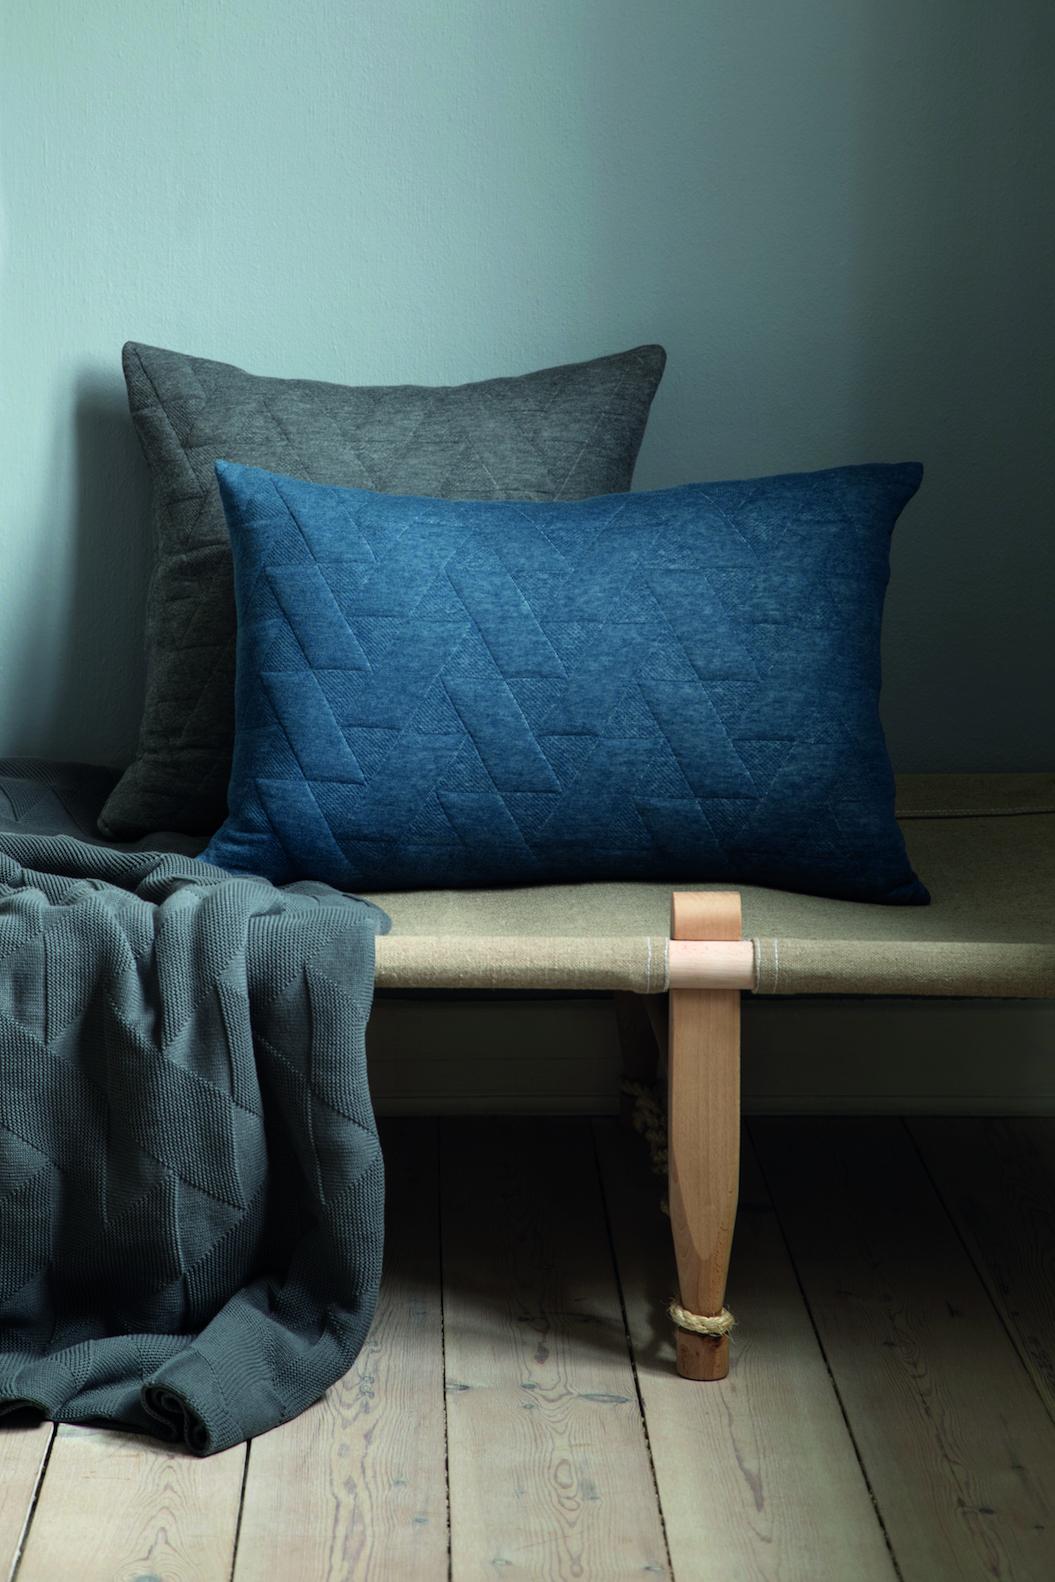 Architectmade-FJ-Pattern-Organic-Cotton-Pillows-Blankets-Denmark-Finn-Juhl-4